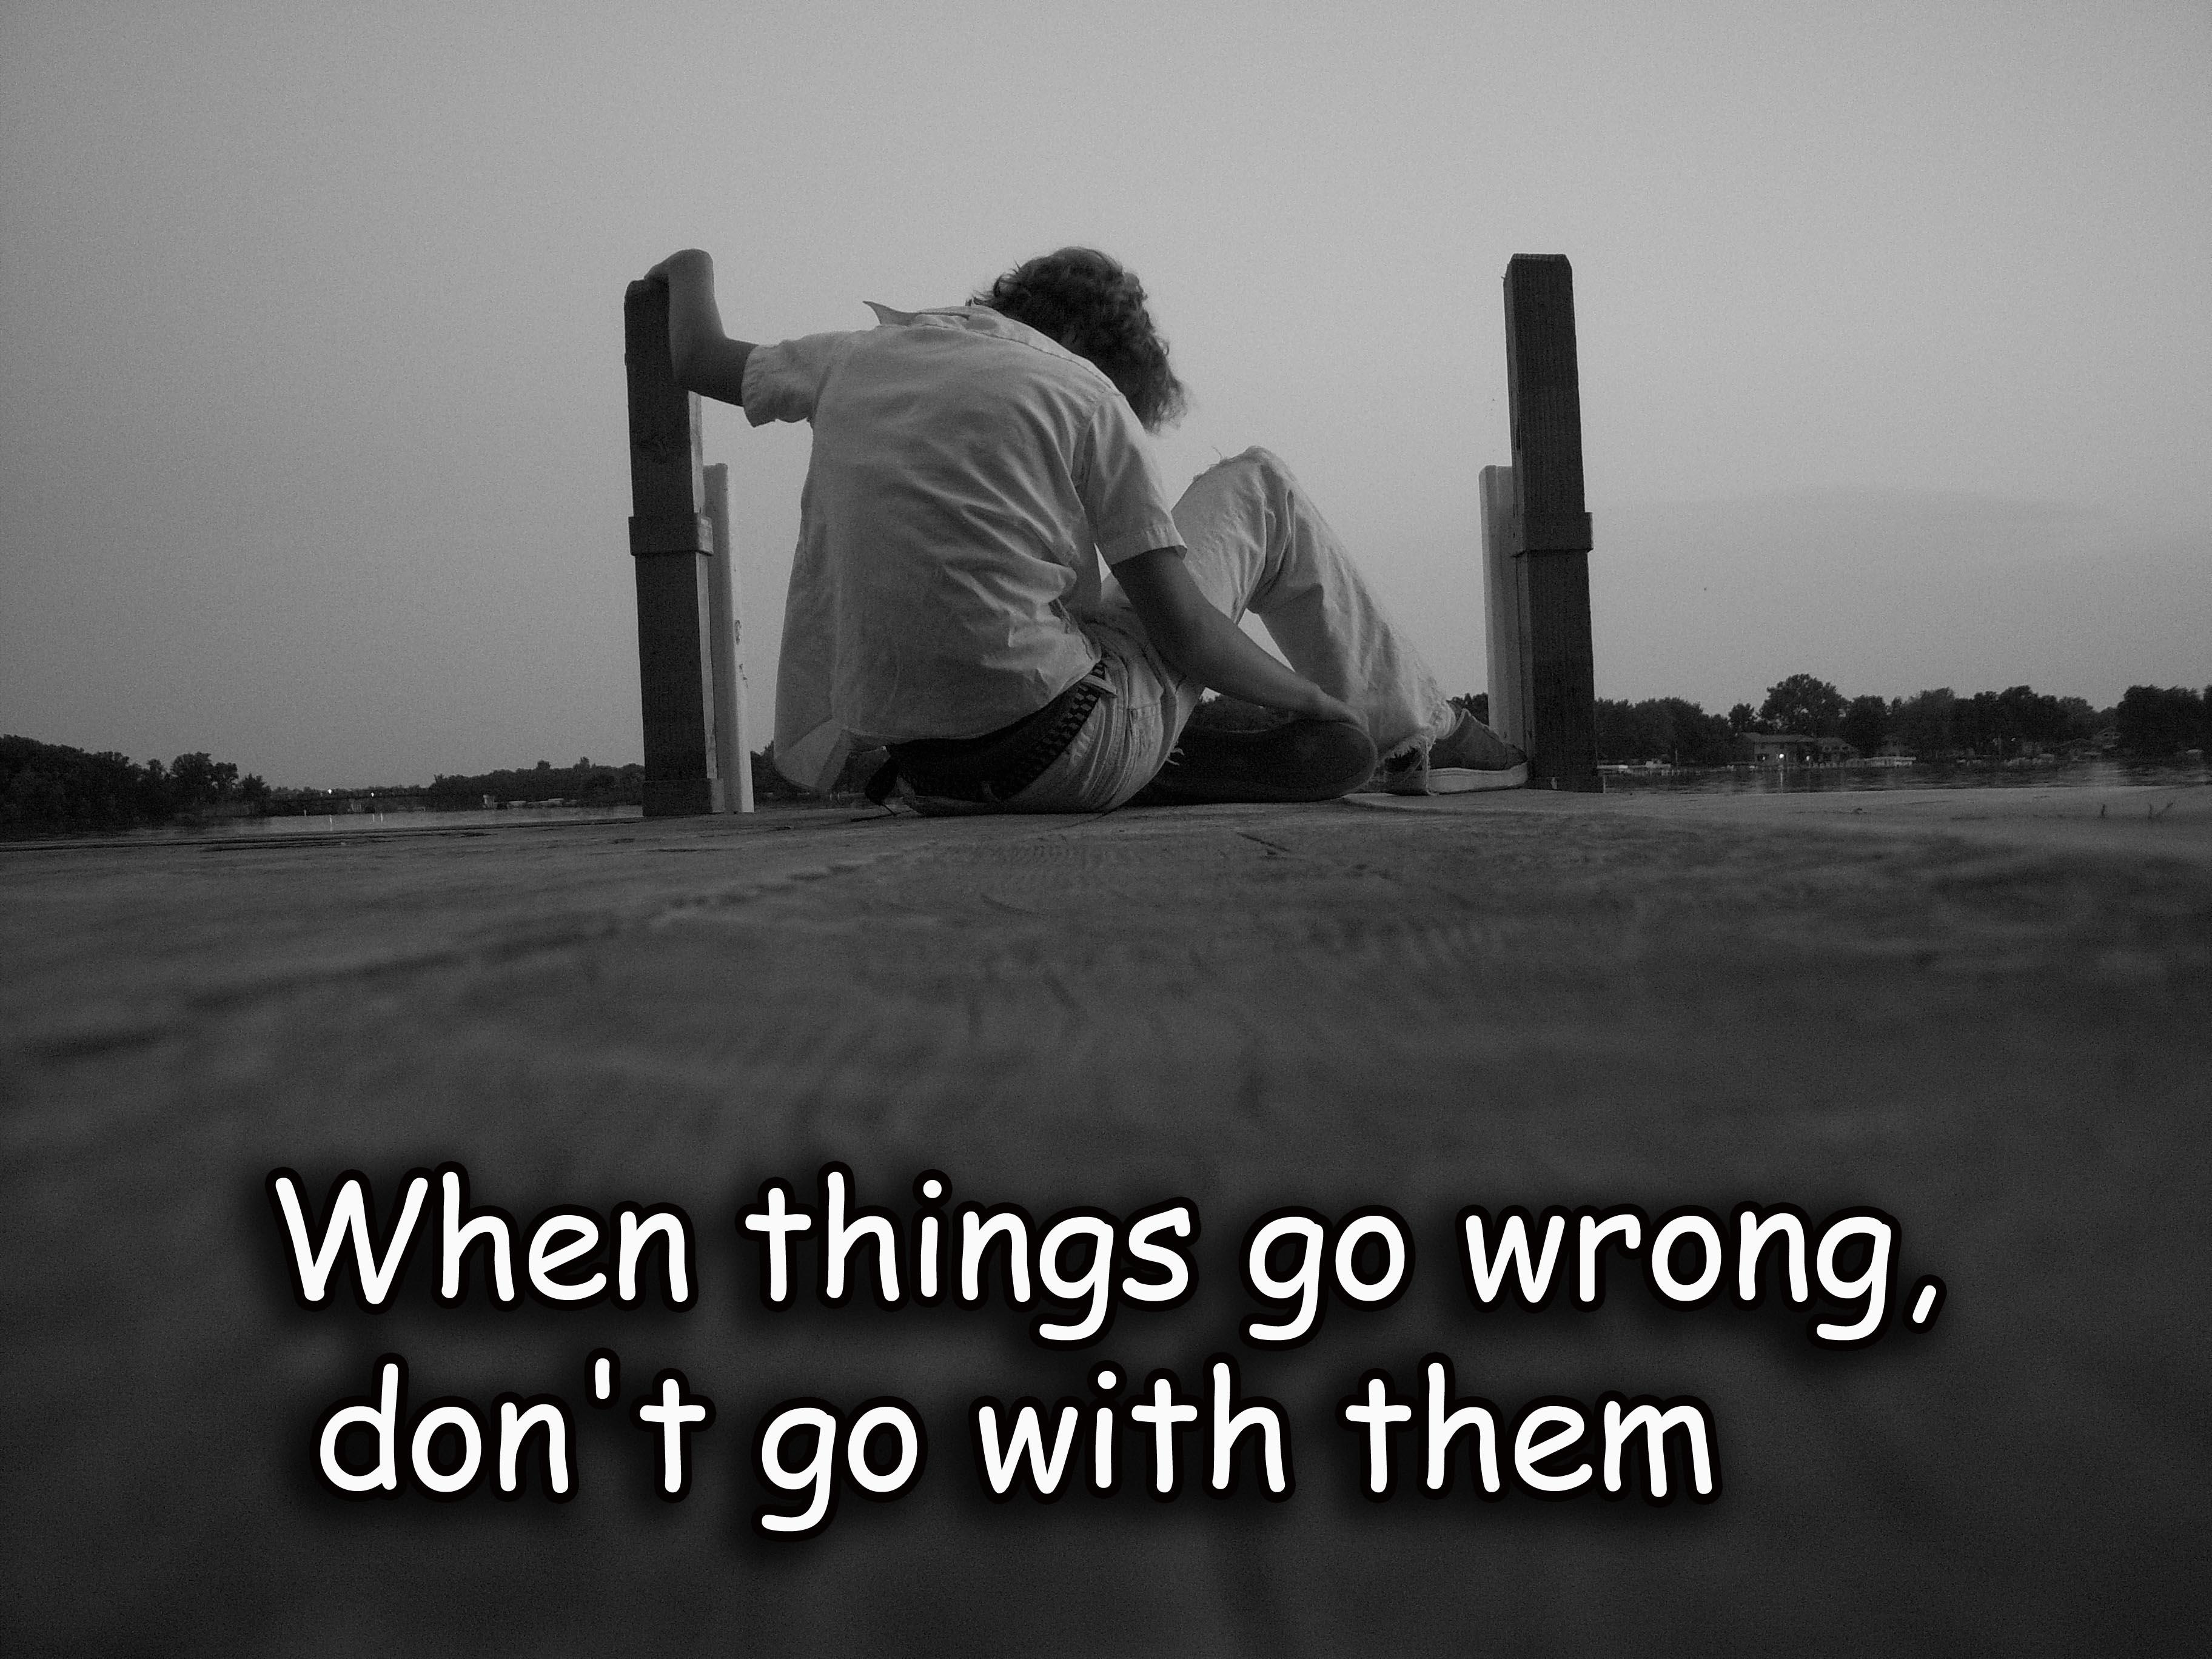 Sad Love Quotes And Sayings Quotesgram: Sad Hopeless Quotes. QuotesGram